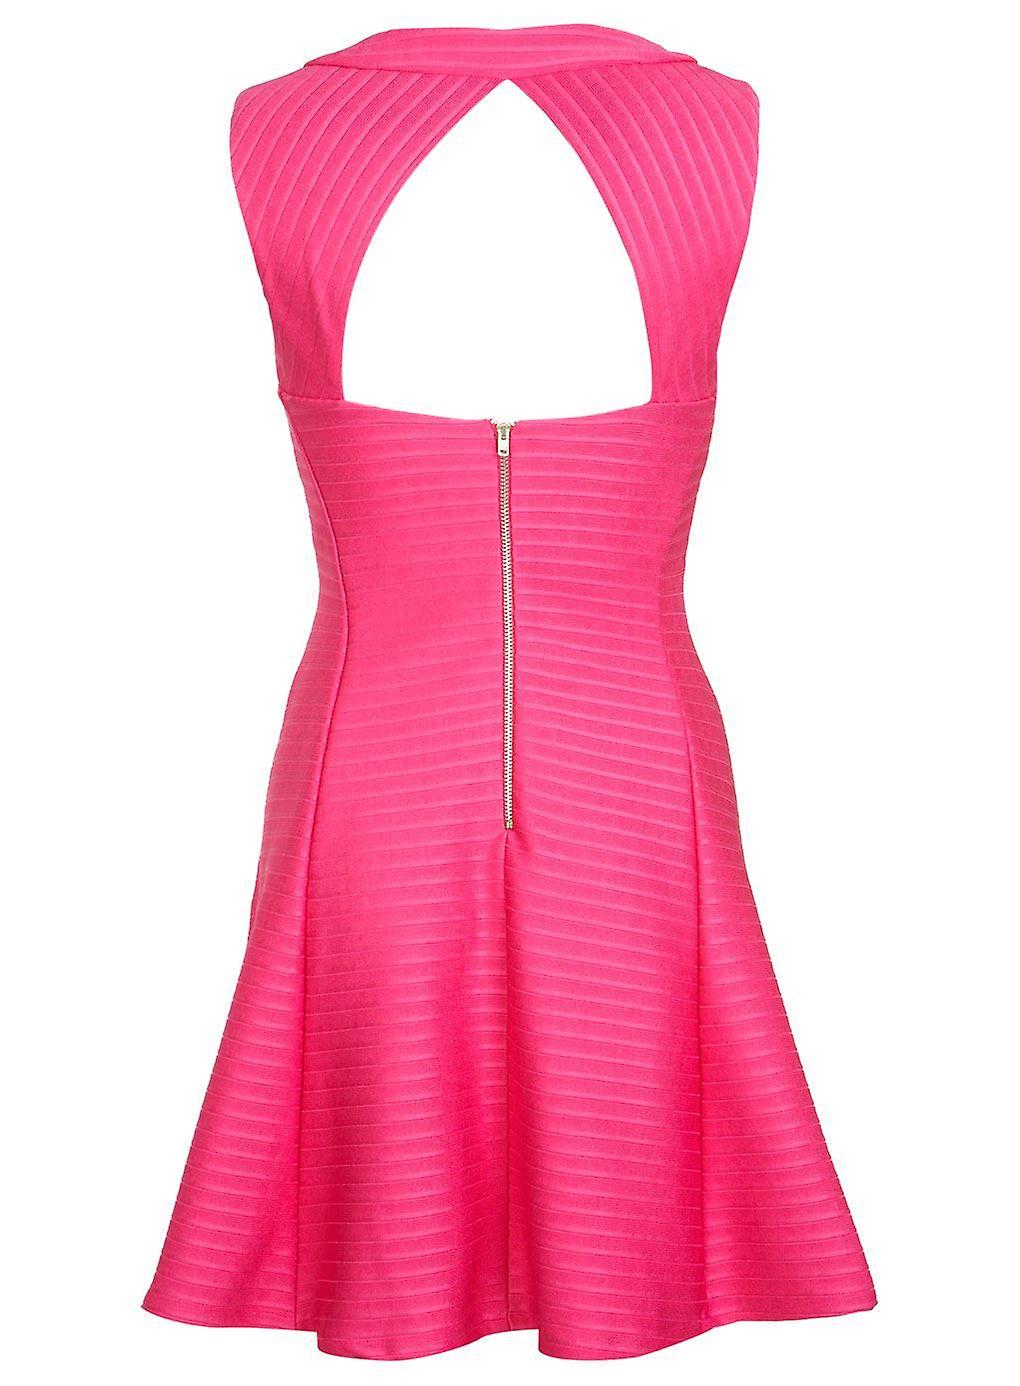 Miss Selfridge Bandage Rib Skater Dress SIZE 16'S ONLY!